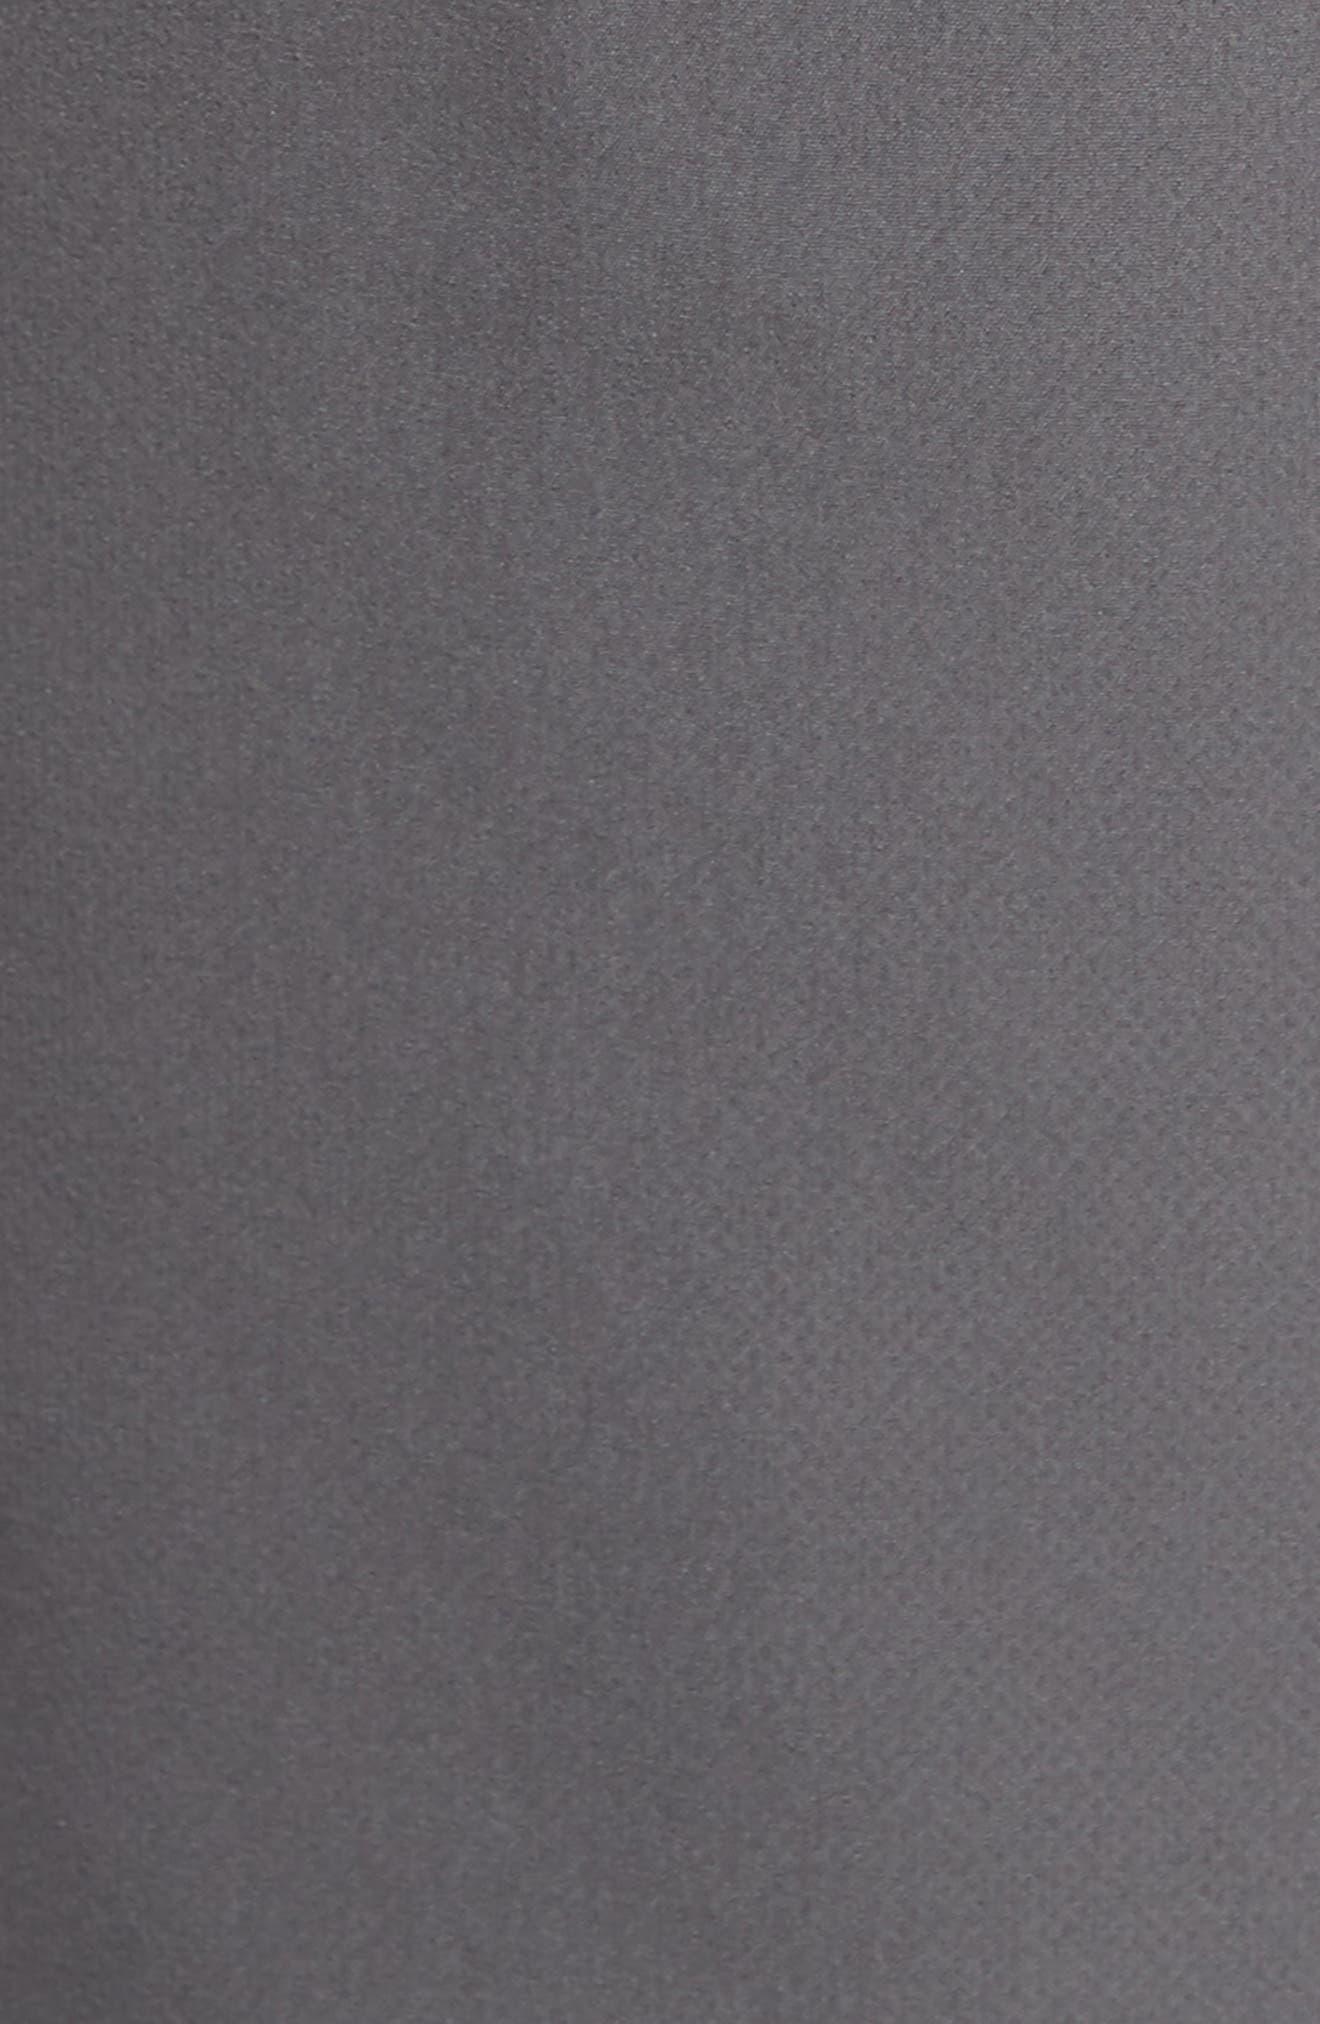 Hybrid Flex Golf Shorts,                             Alternate thumbnail 6, color,                             Dark Grey/ Black